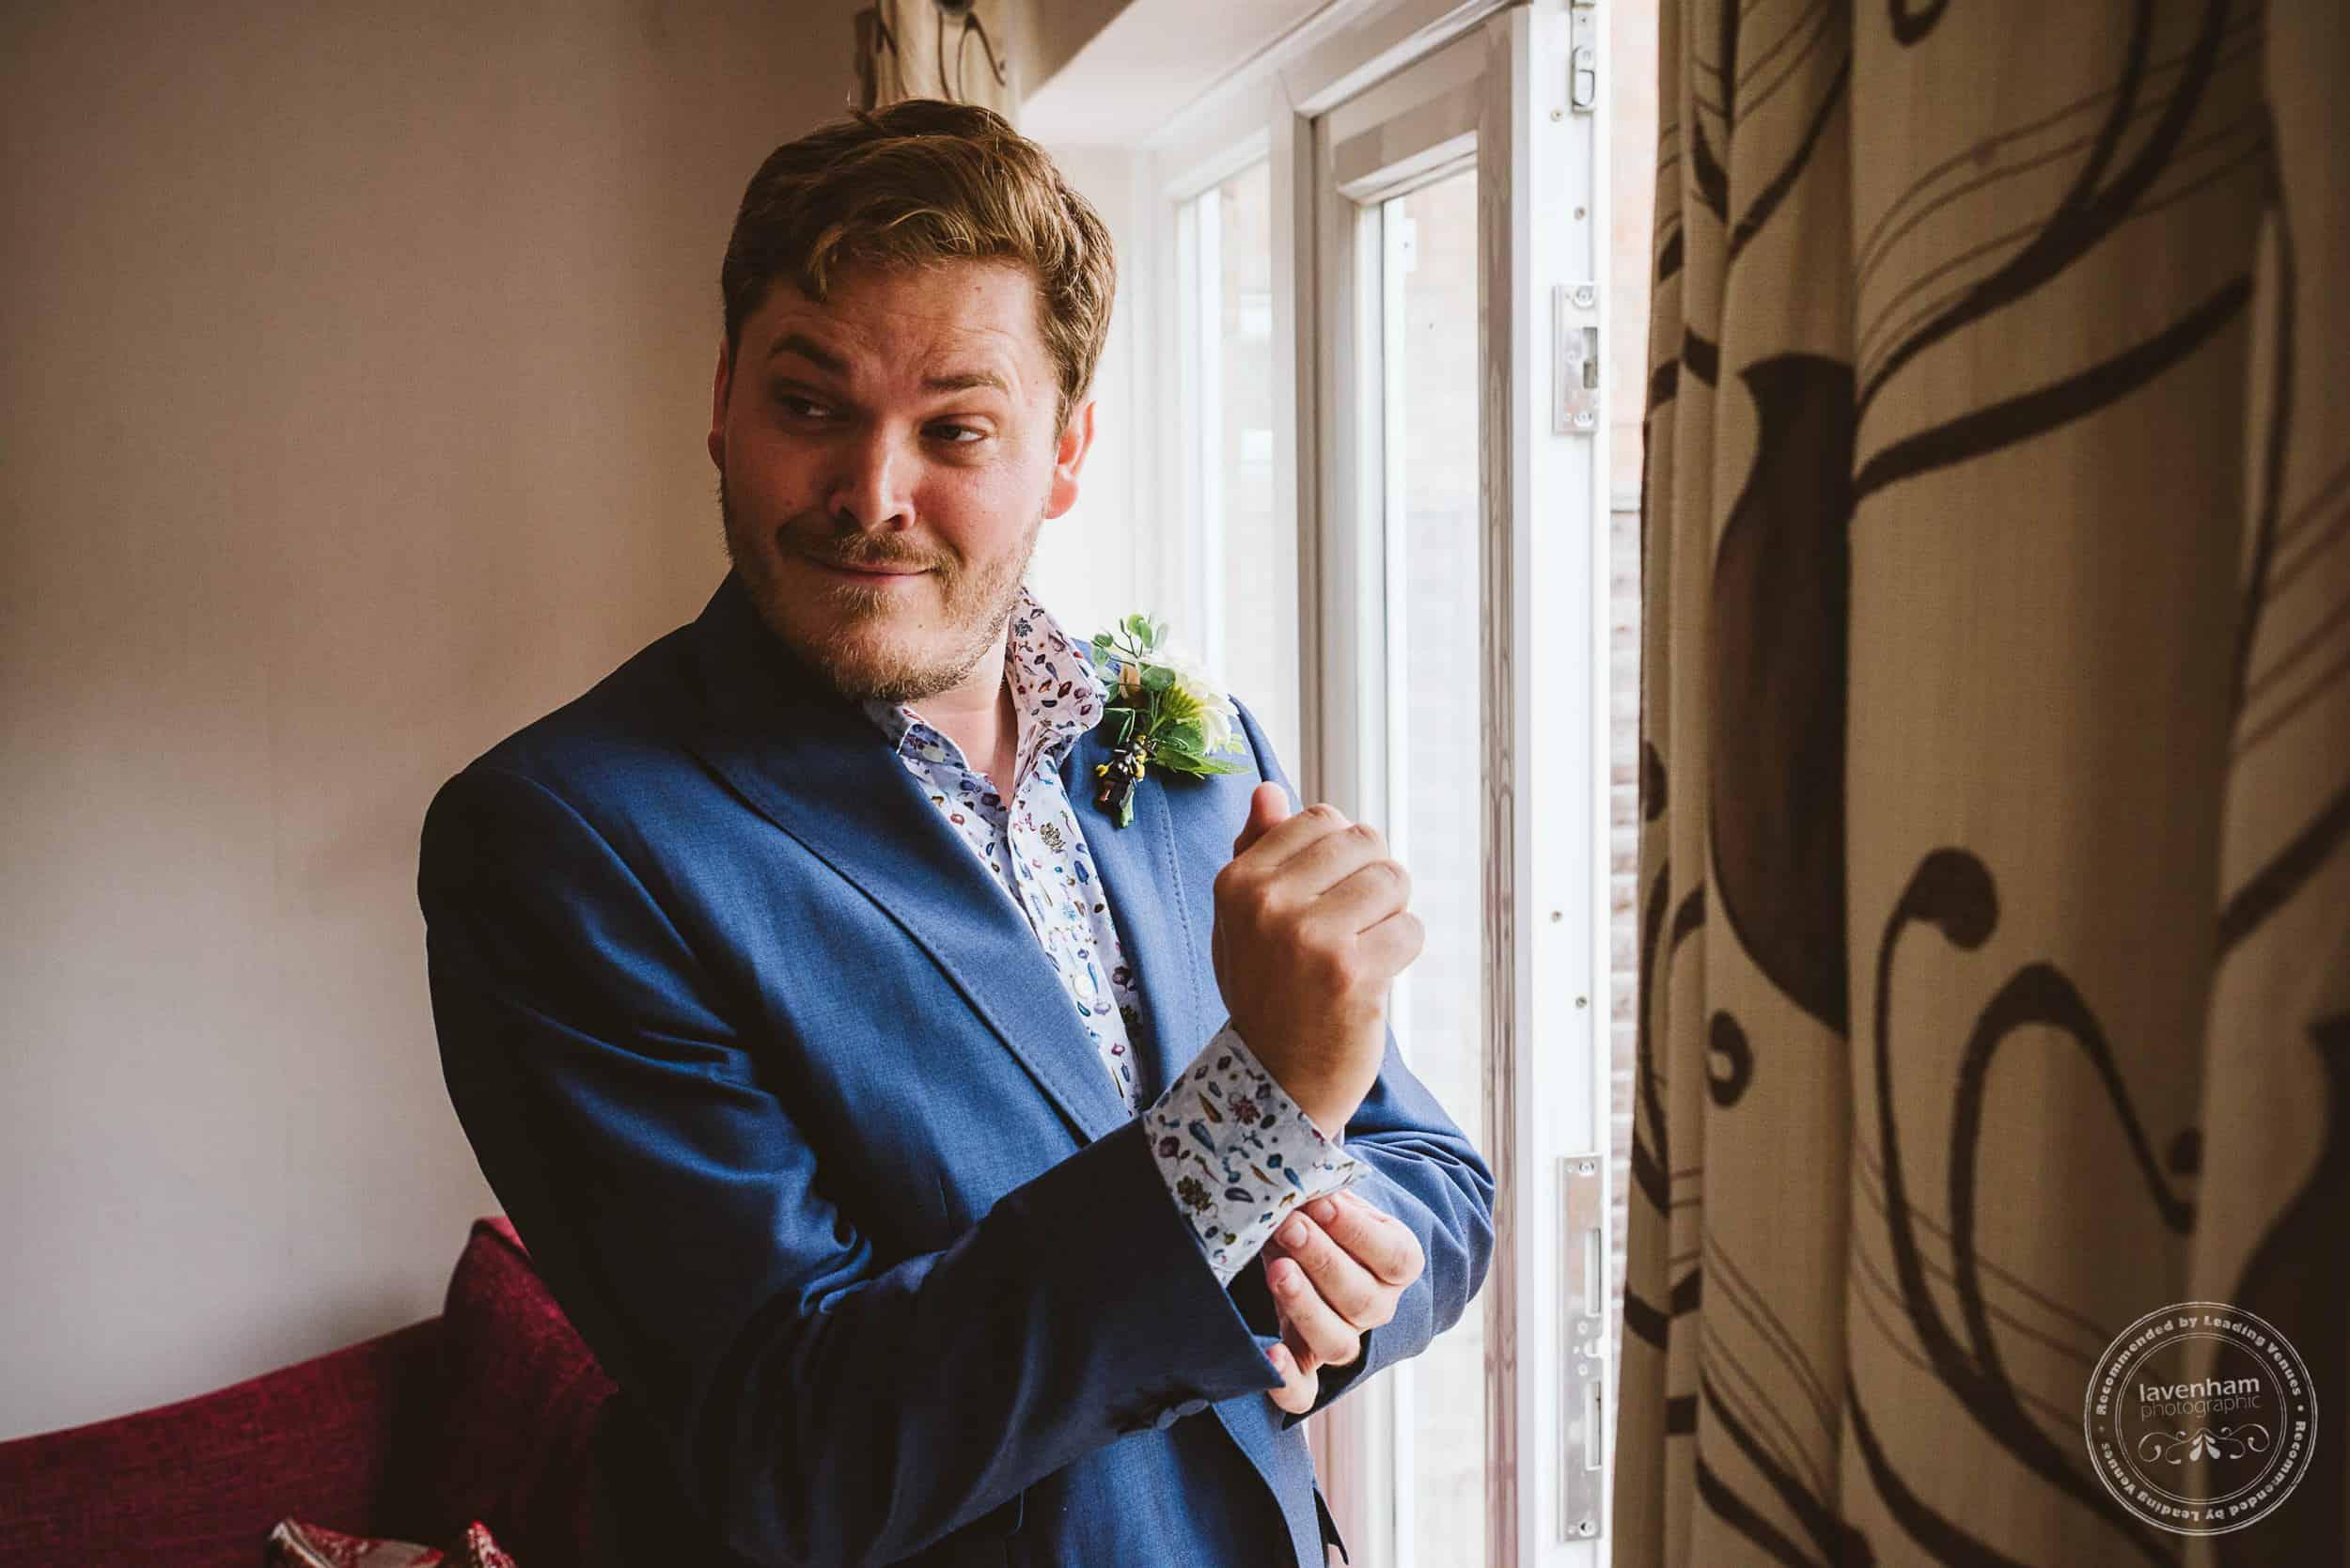 180818 Marks Hall Wedding Photography Lavenham Photographic 014